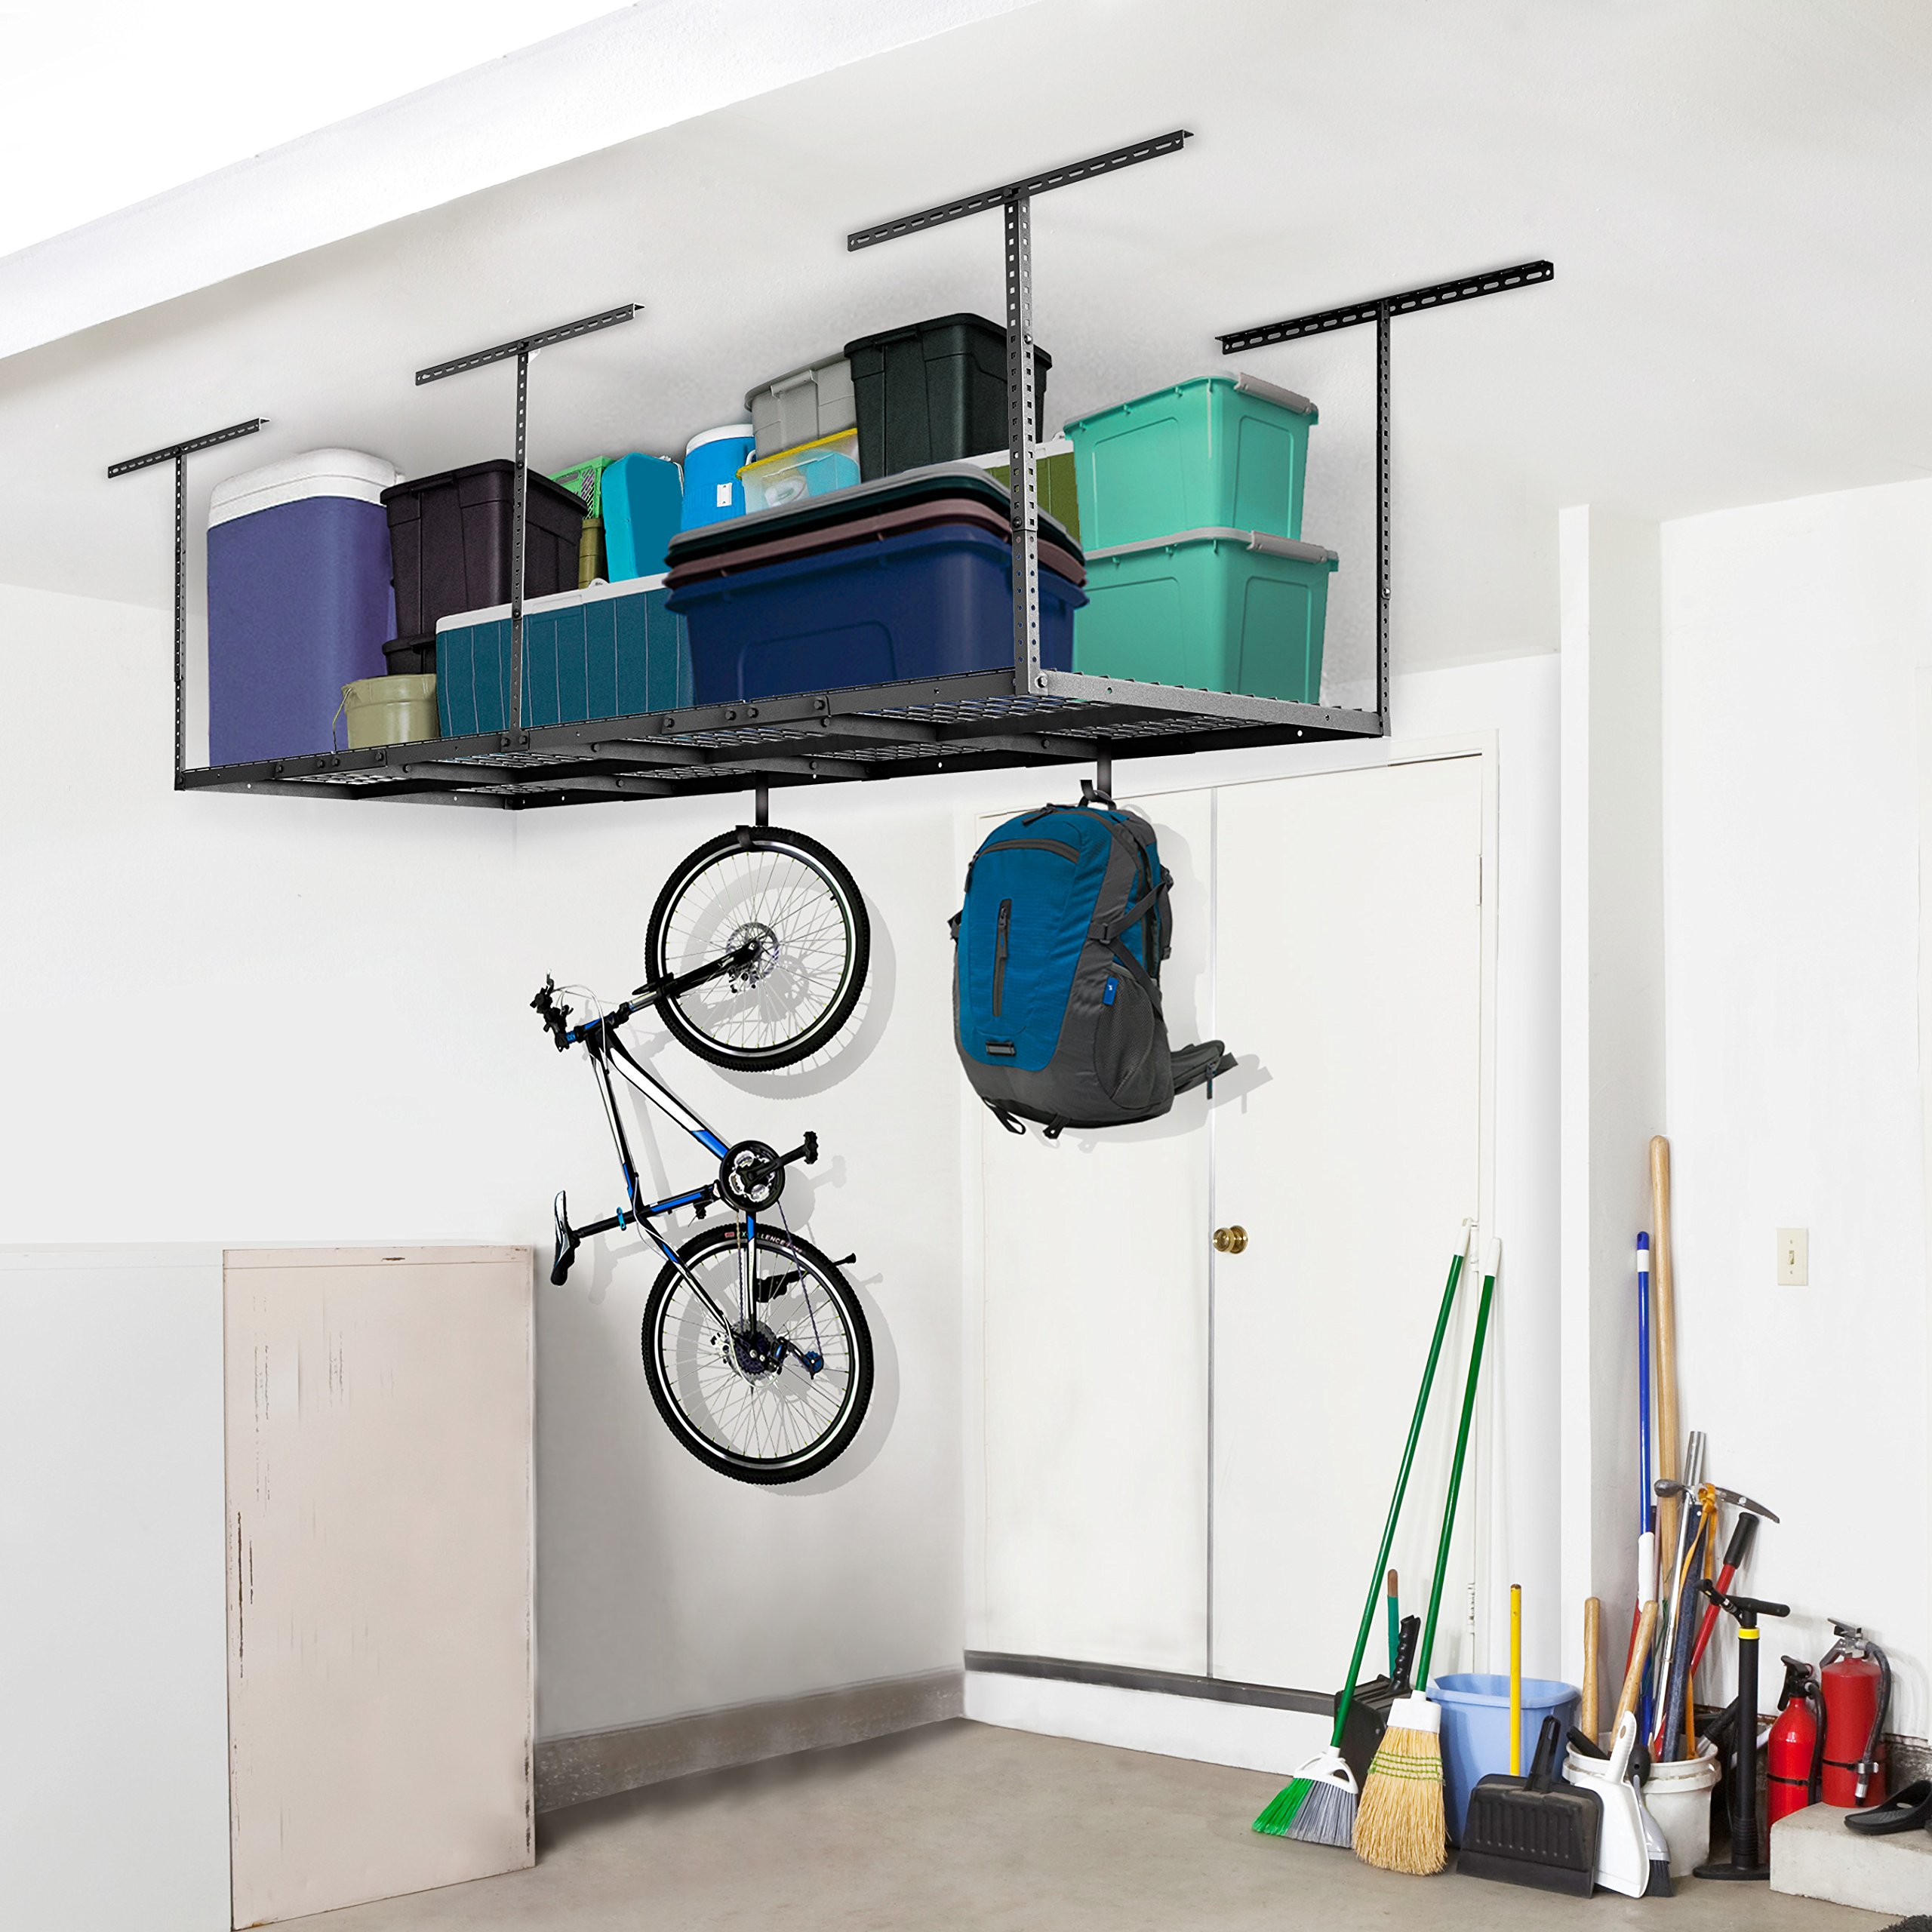 Fleximounts 4x8 Overhead Garage Rack with Add-on Hooks Set Heavy Duty Height Adjustable Ceiling Racks (22''-40'' Ceiling Dropdown), Black